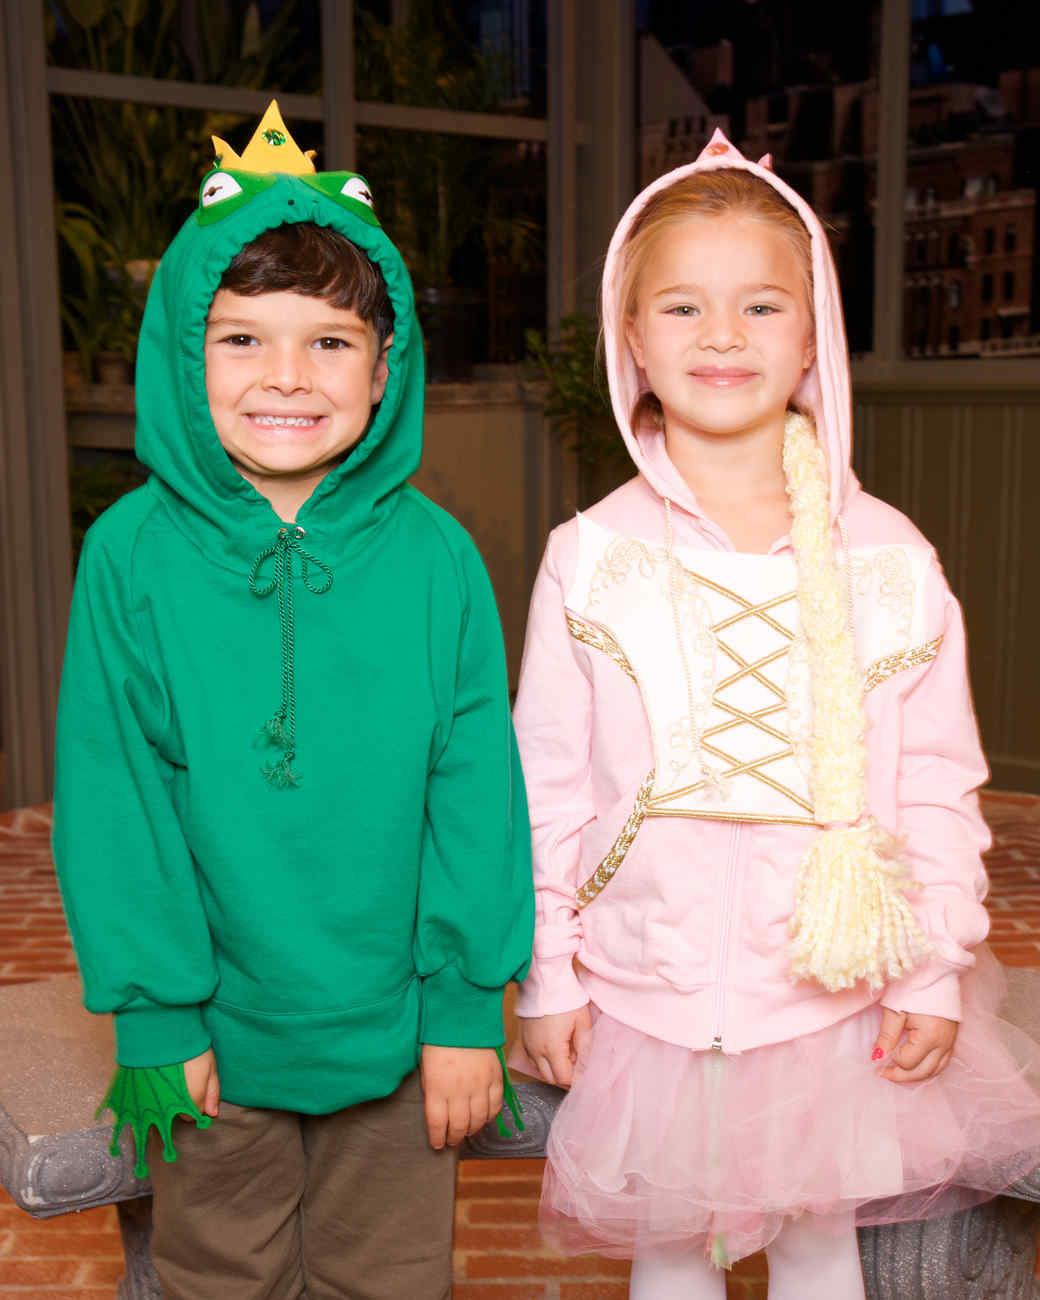 Hoodie Costumes: Frog Prince and Princess